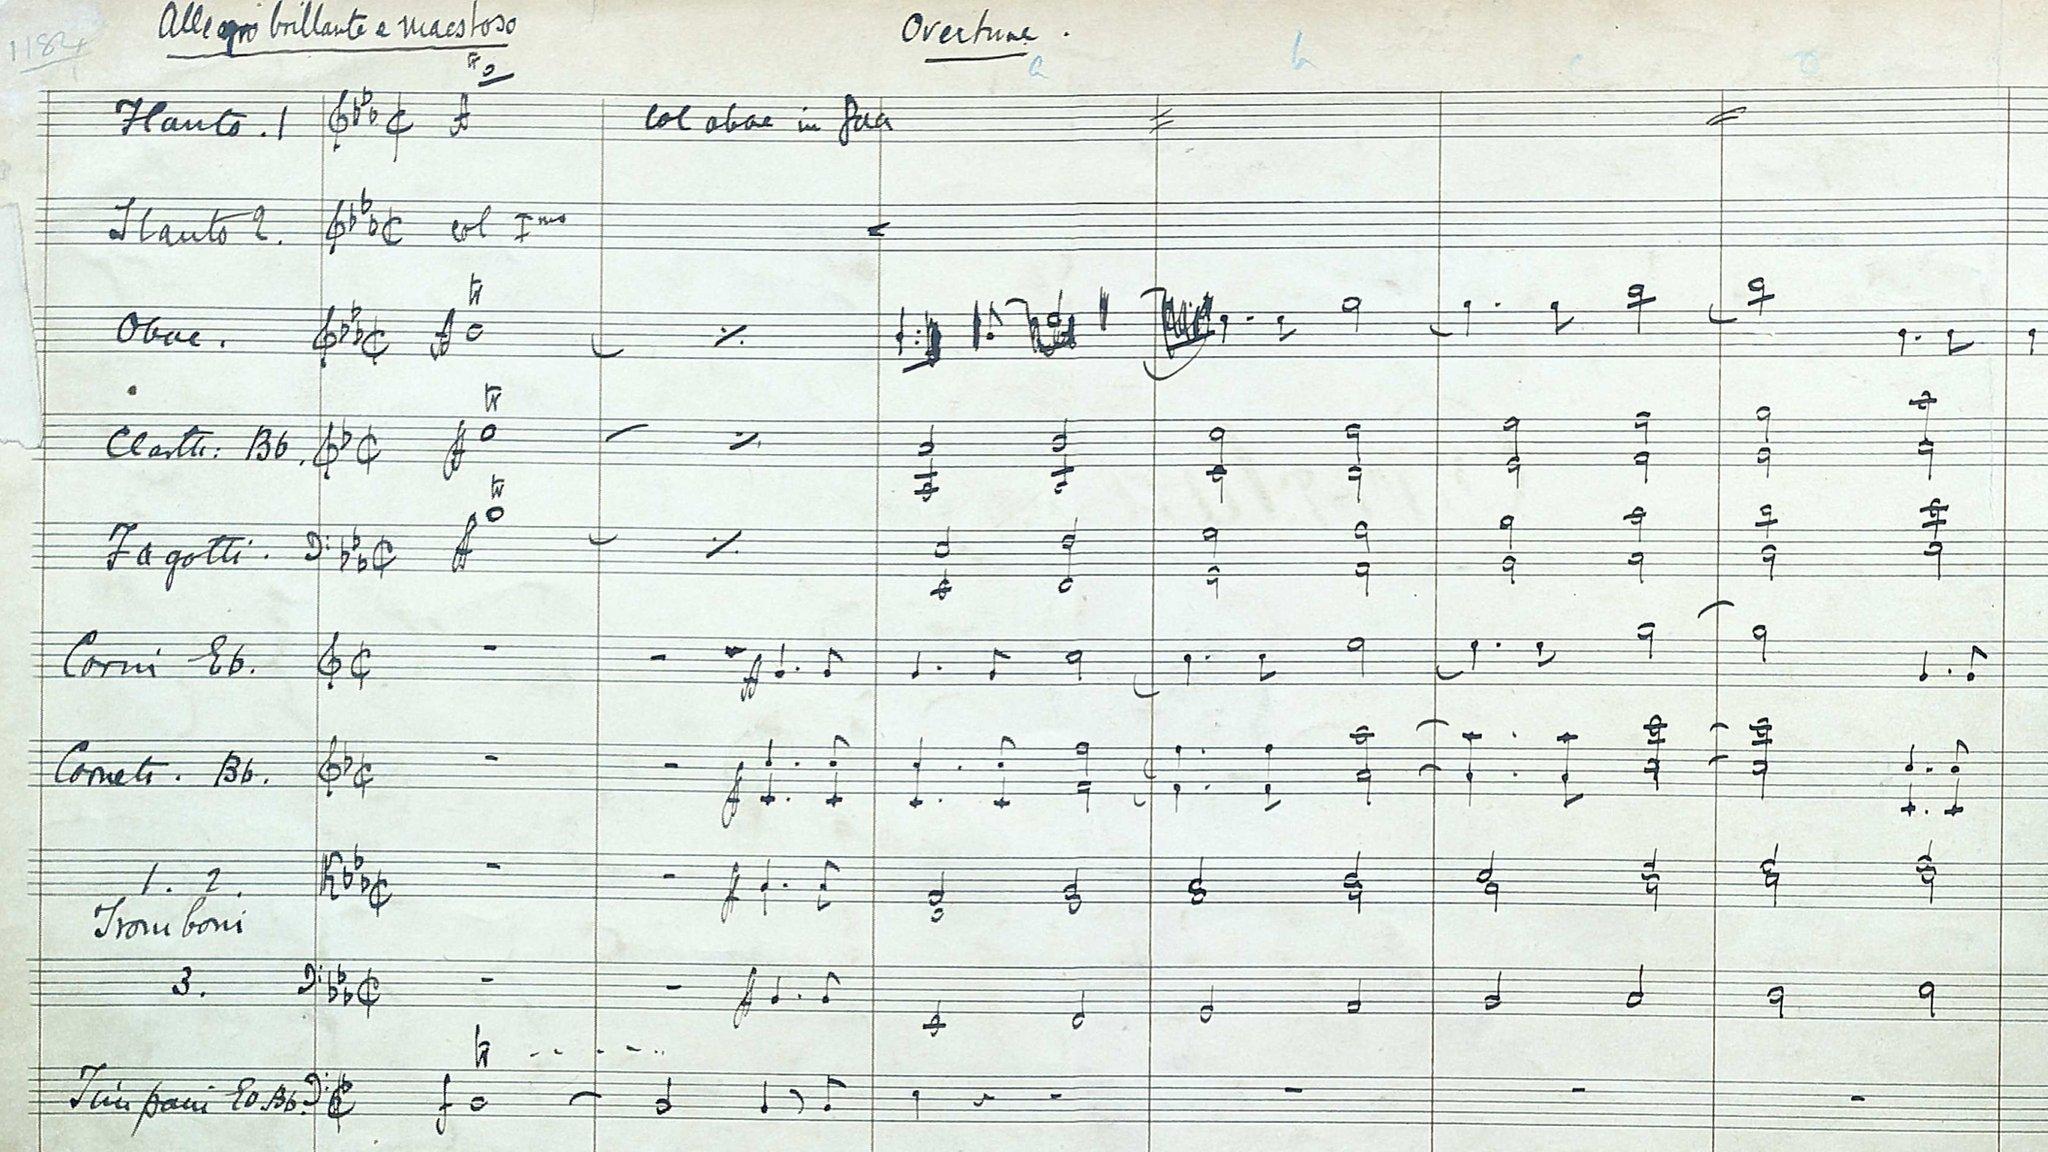 Gilbert and Sullivan score restored